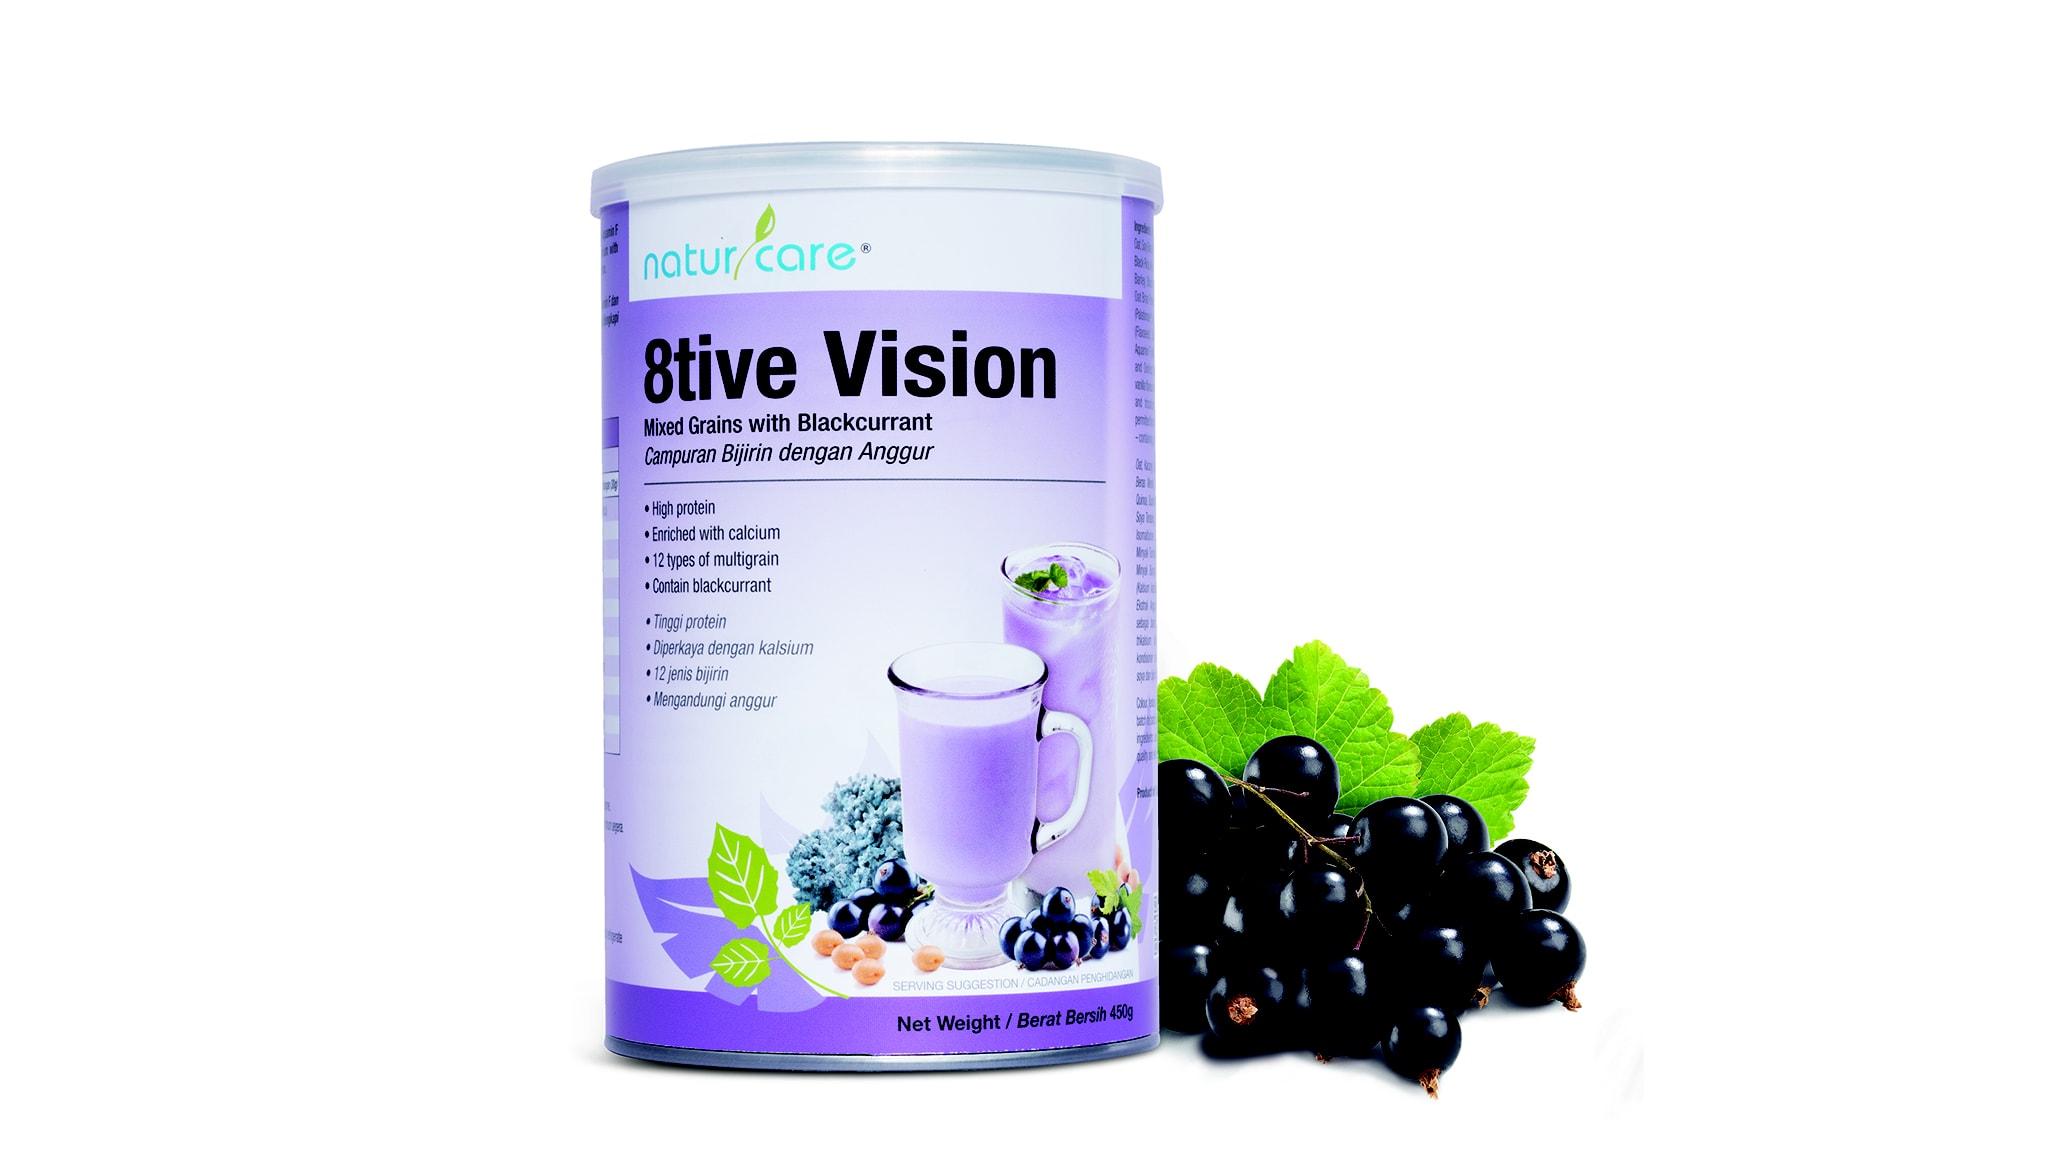 NatureCare® 8tive Vision (1) 450g